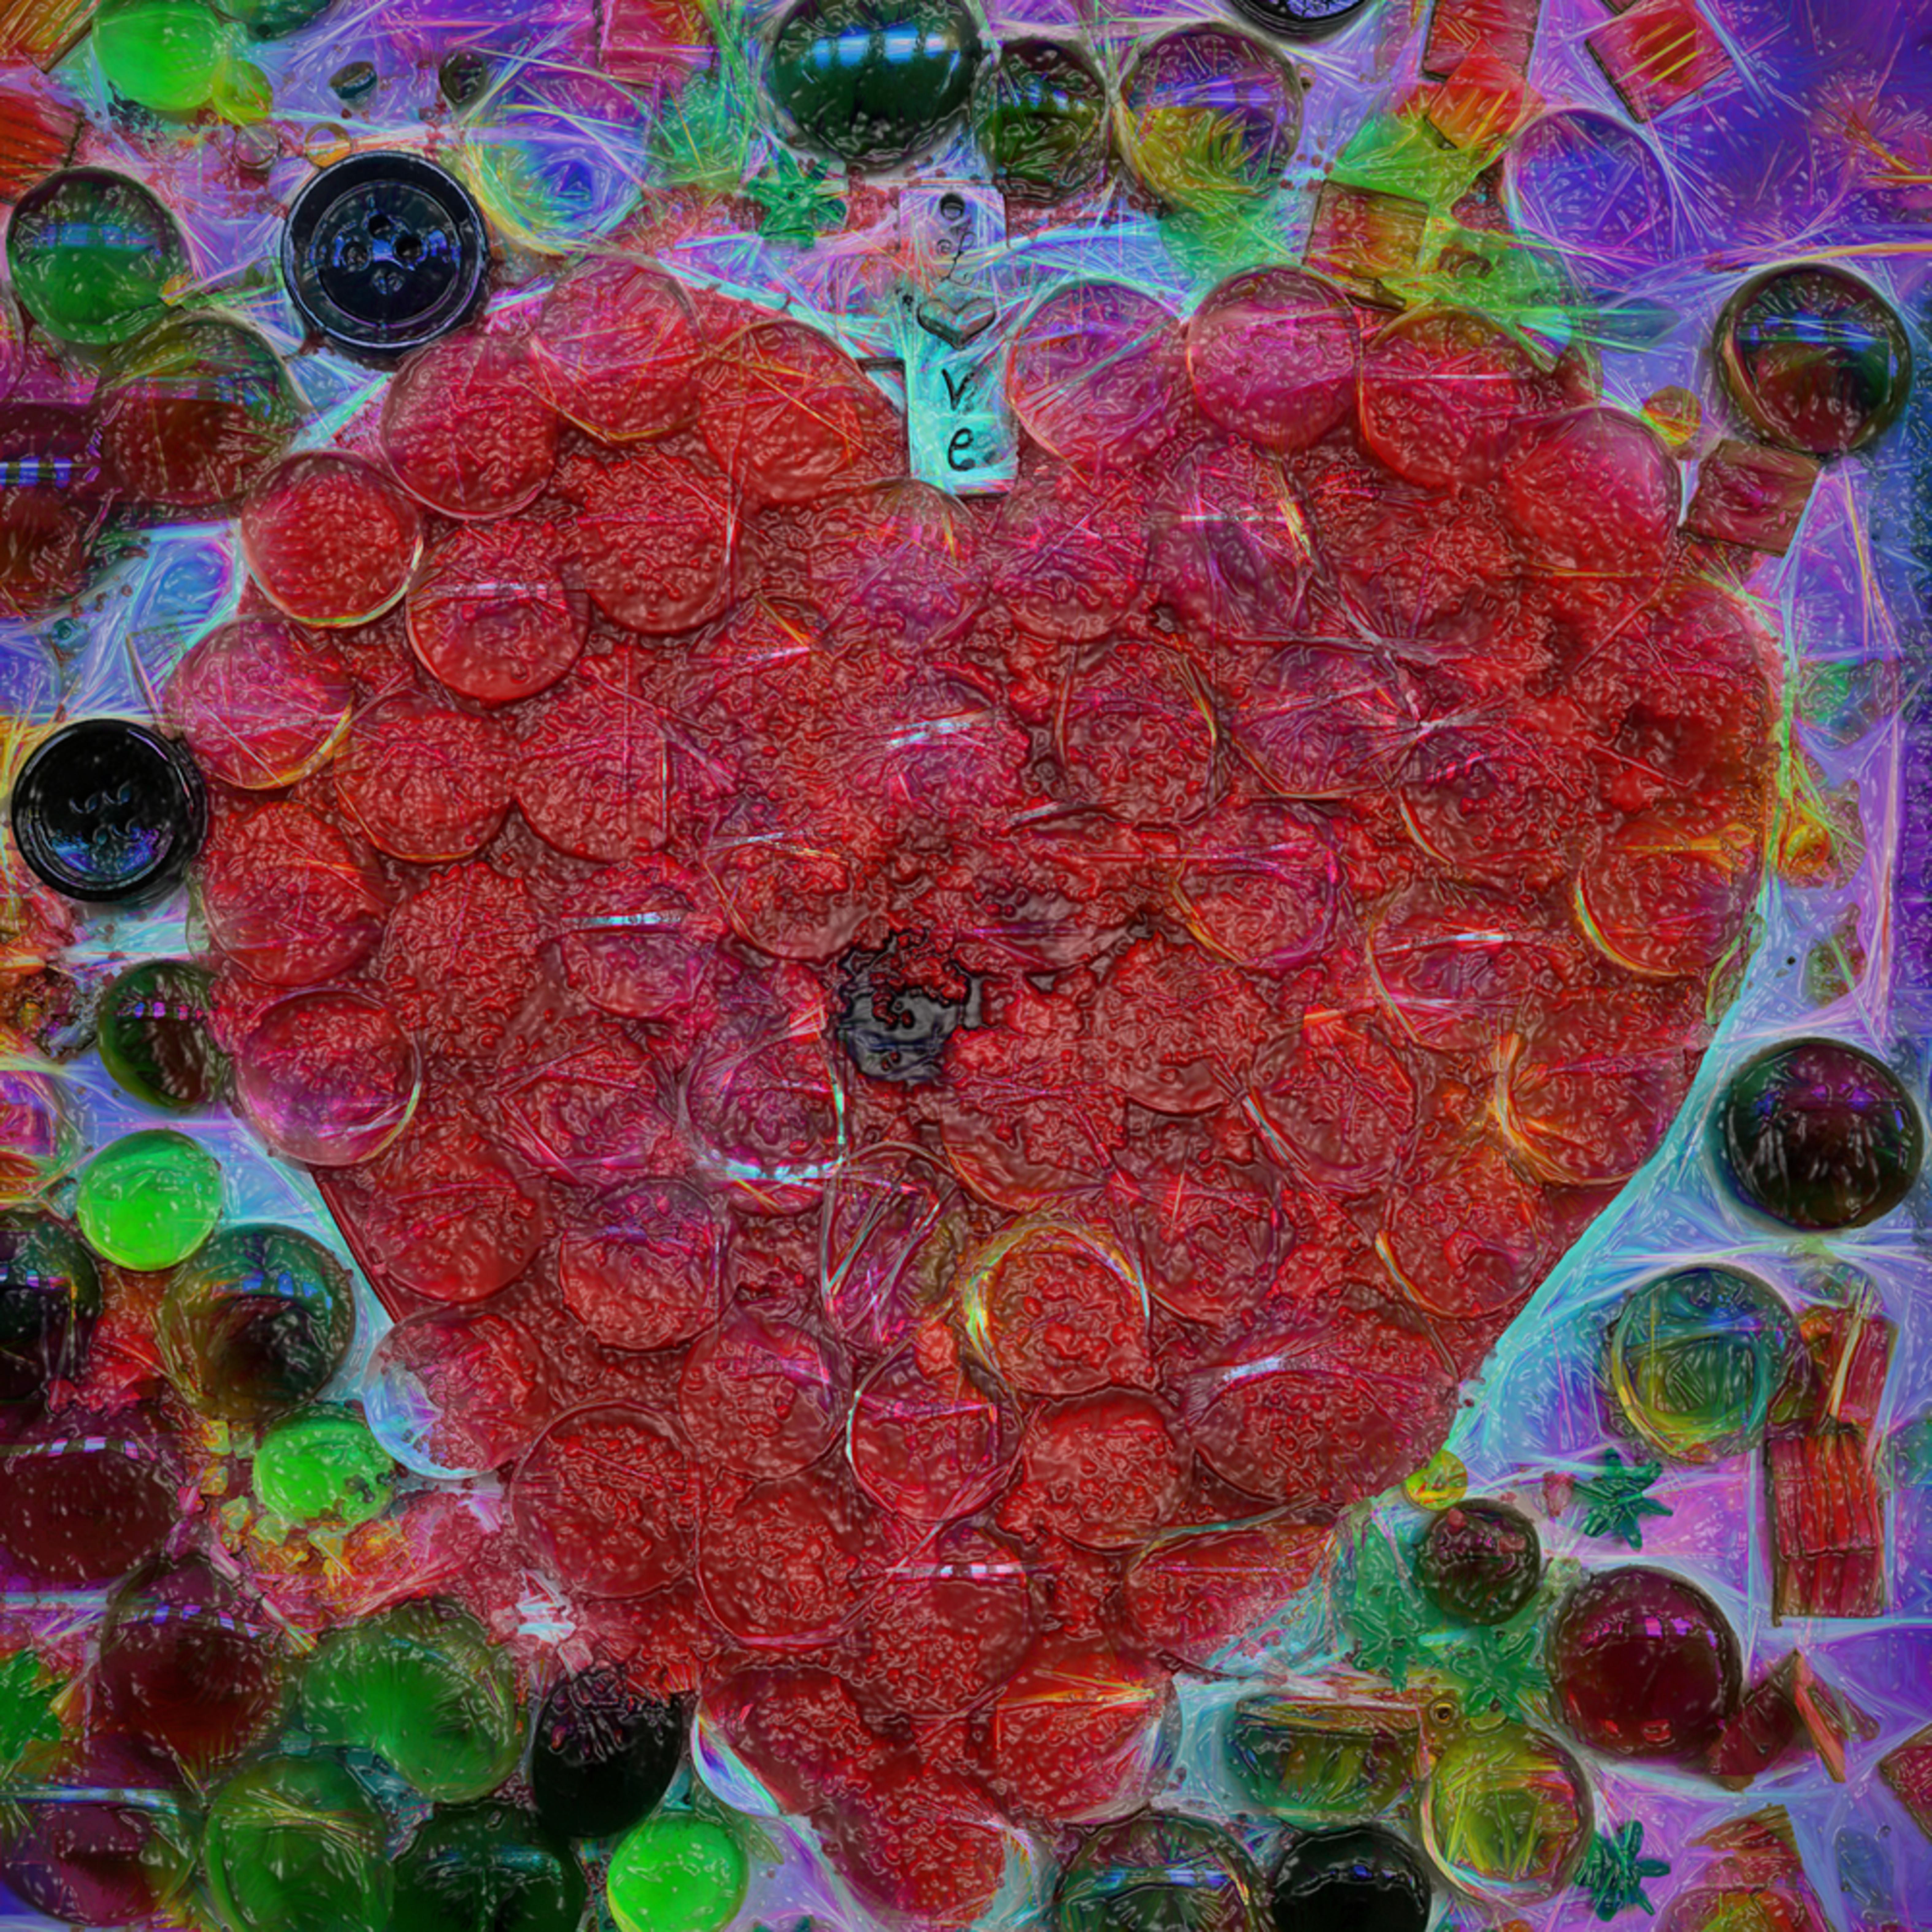 Candy heart pf8g0s